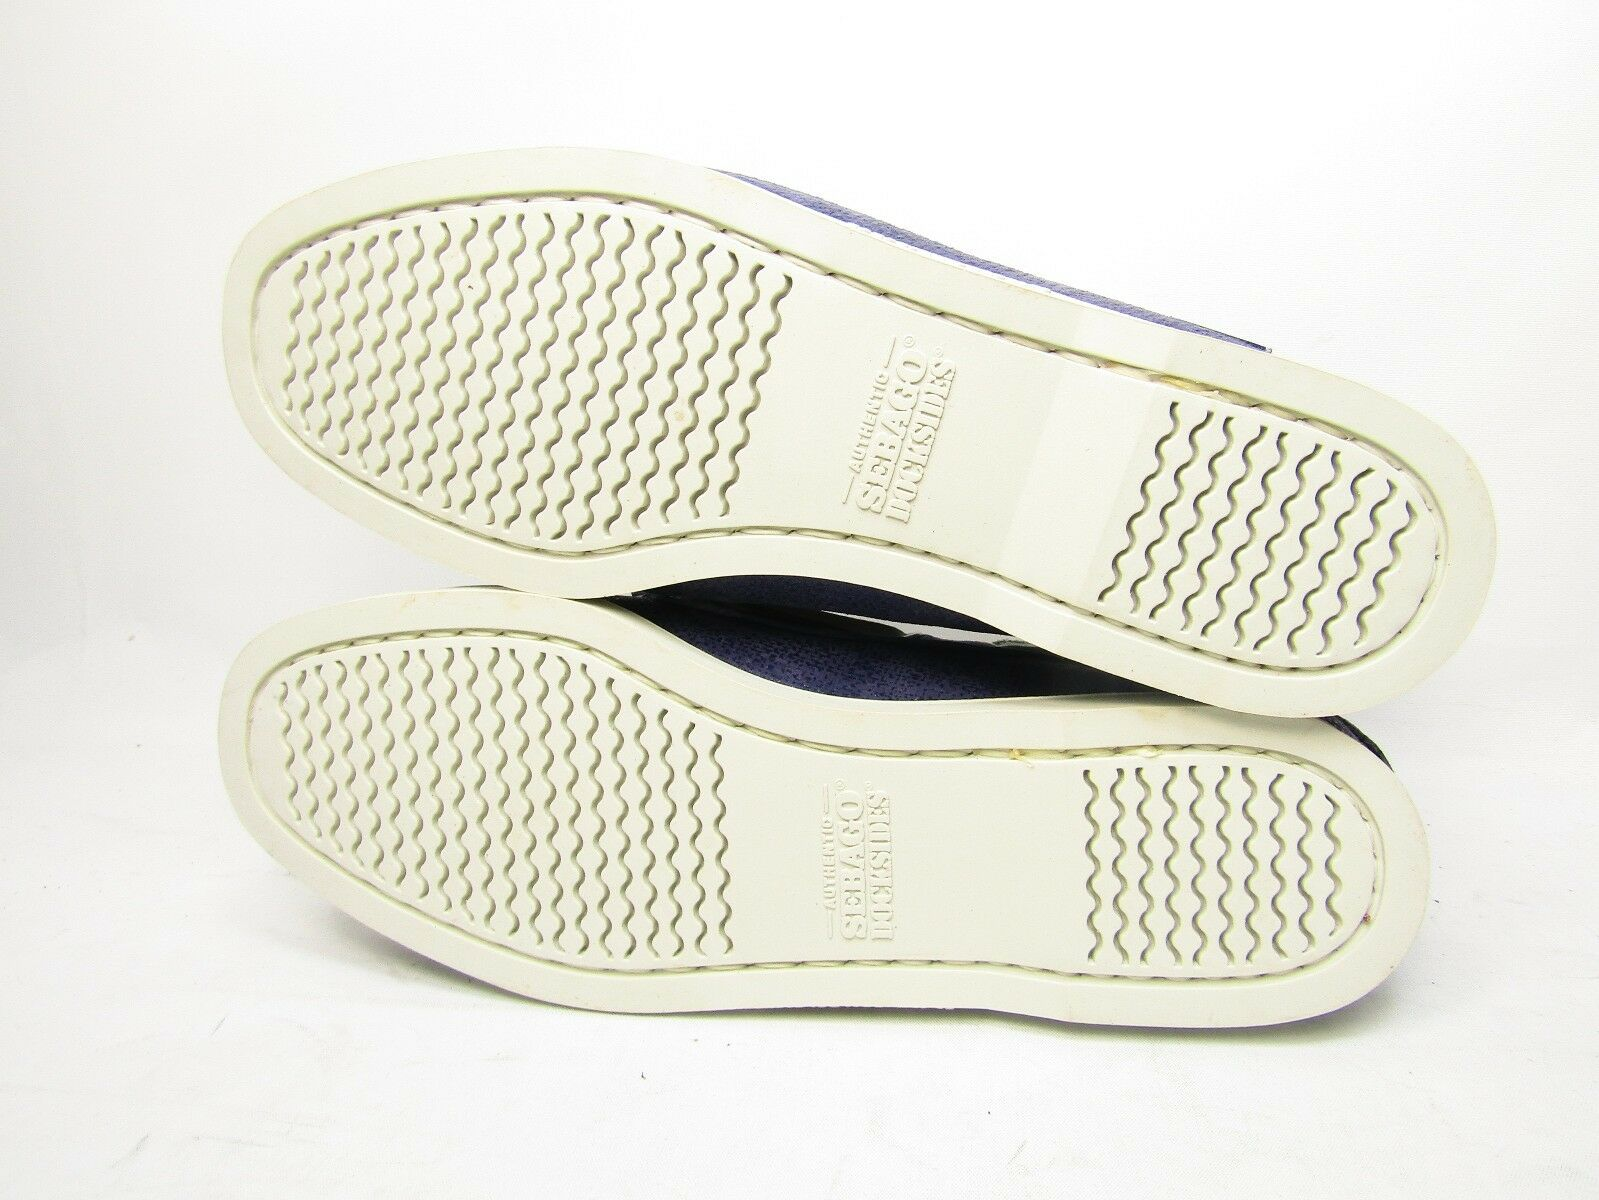 Sebago    Spinnaker  Boat  Women's shoes Carolina bluee Size 9M b47b8d